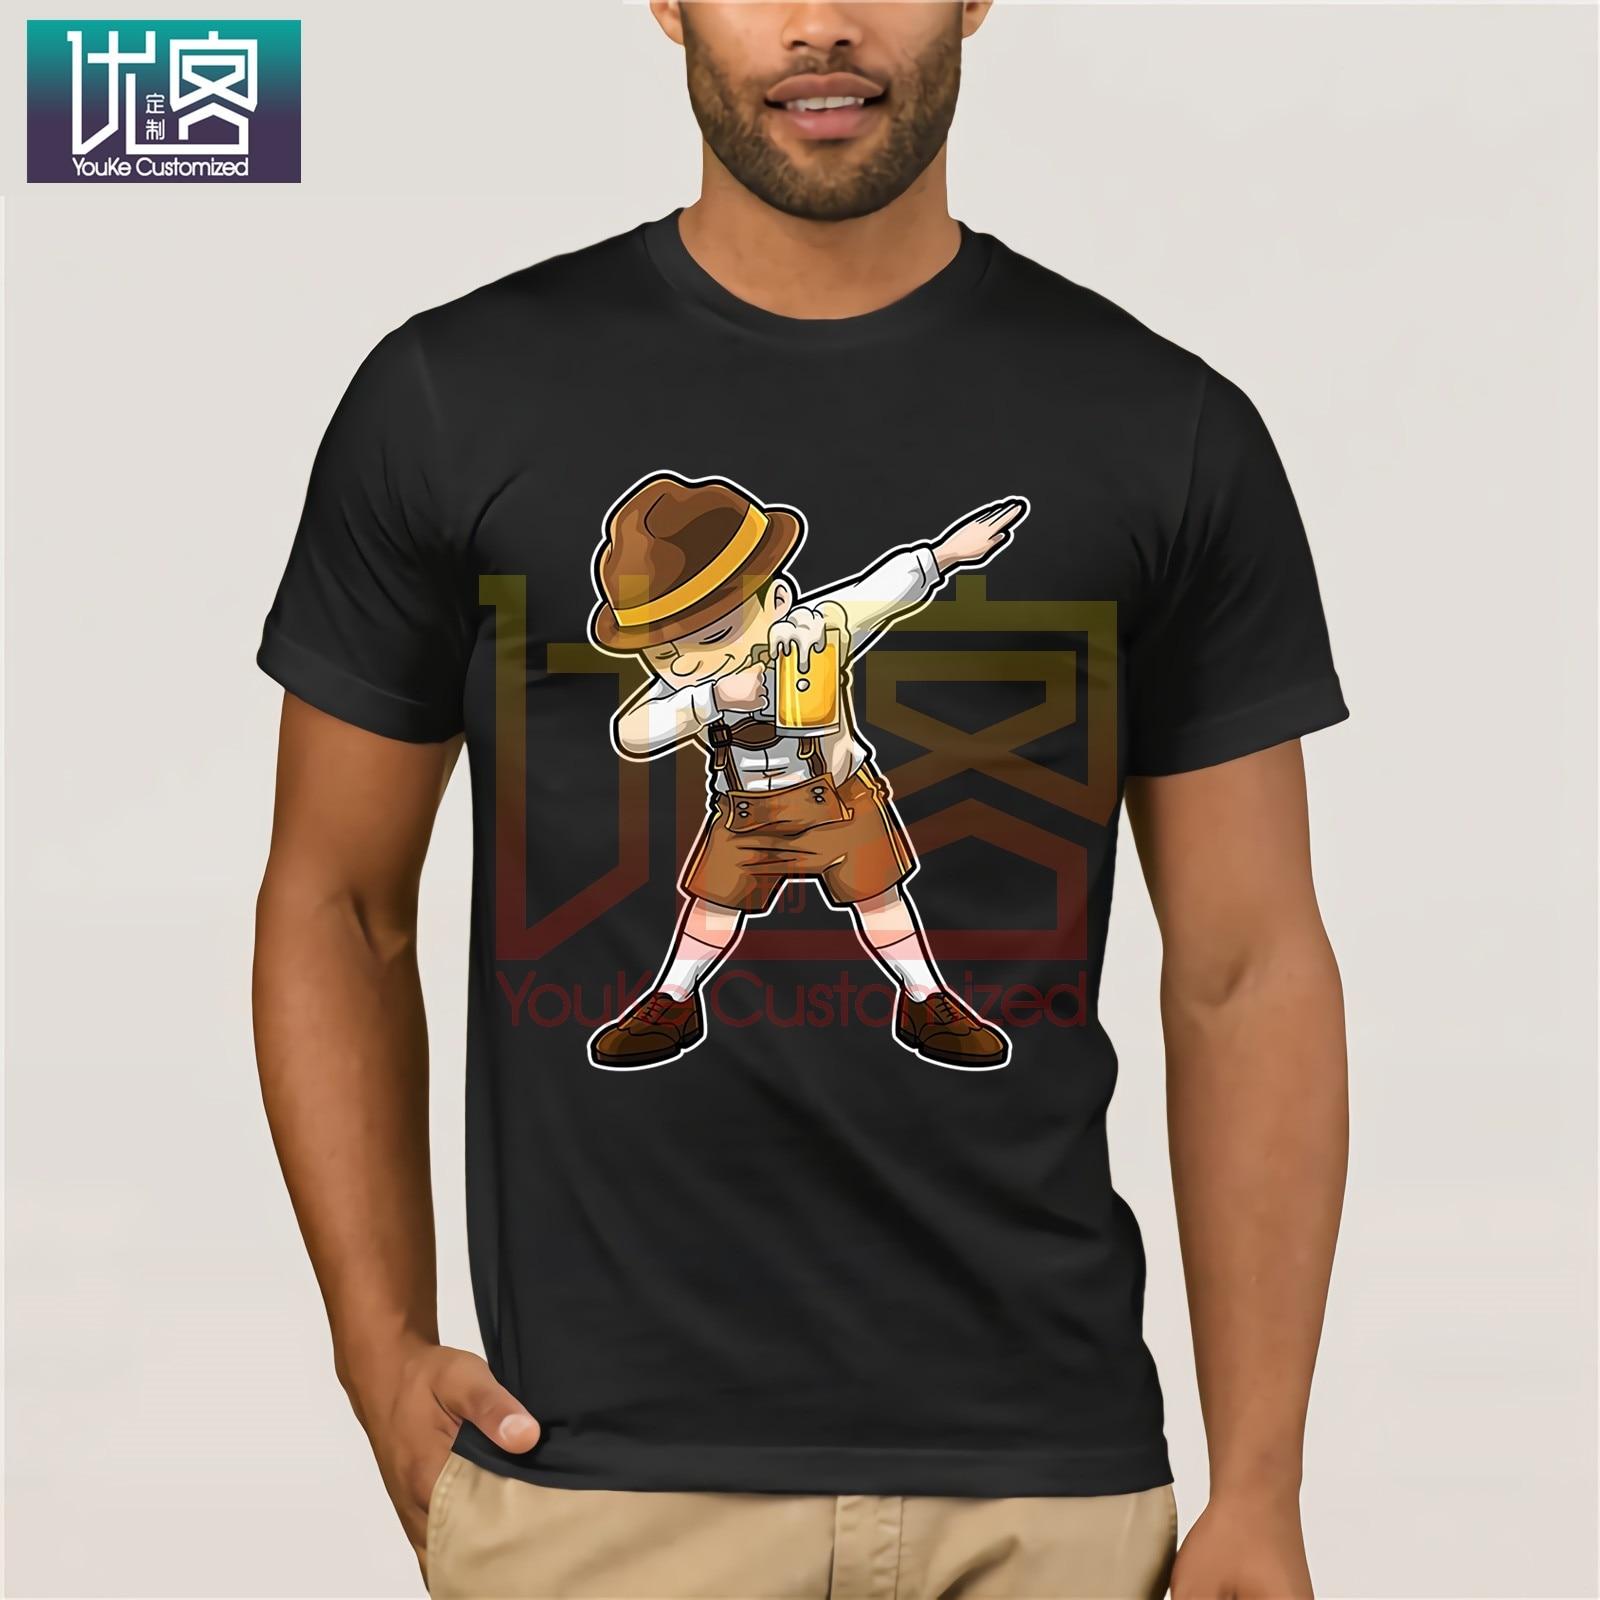 Moda para hombres 2020 Summe divertida camiseta de verano Homme Oktoberfest Lederhosen Dabbing camiseta cerveza camarero Dab Casual Tee